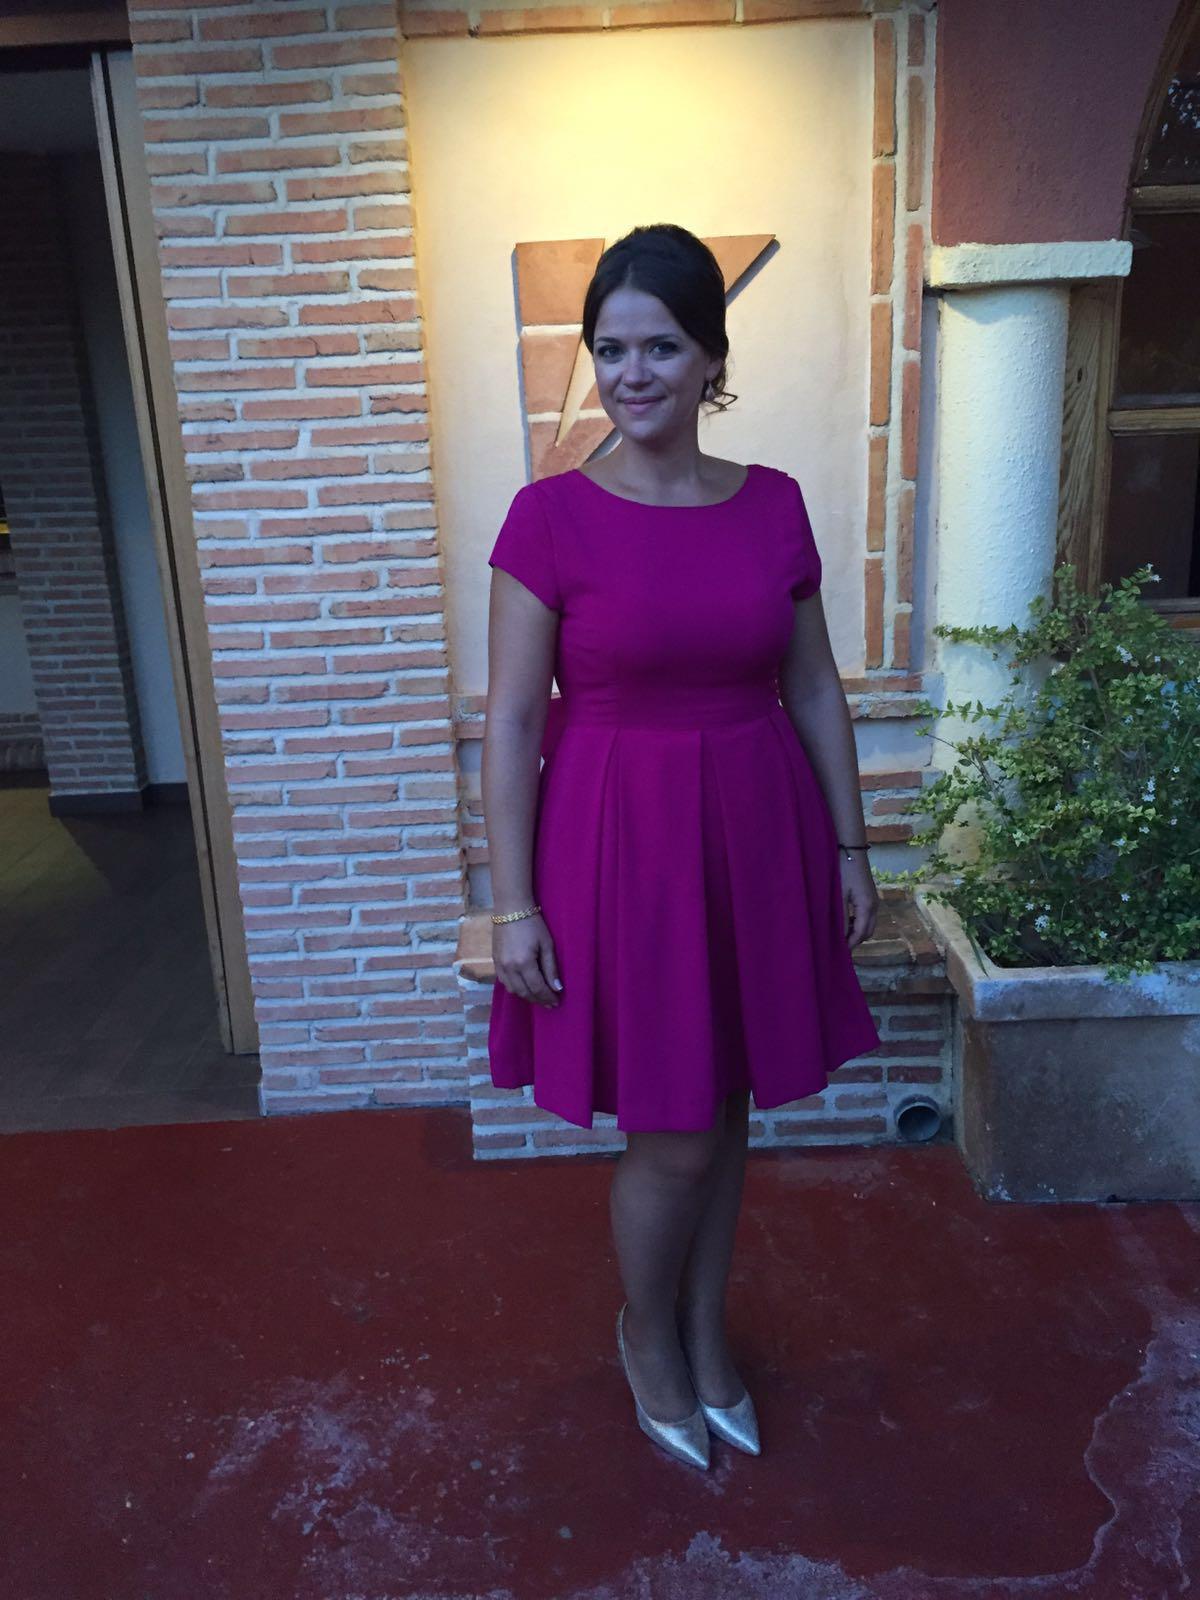 Vistoso Paloma Vestidos De Dama Gris Foto - Ideas de Estilos de ...